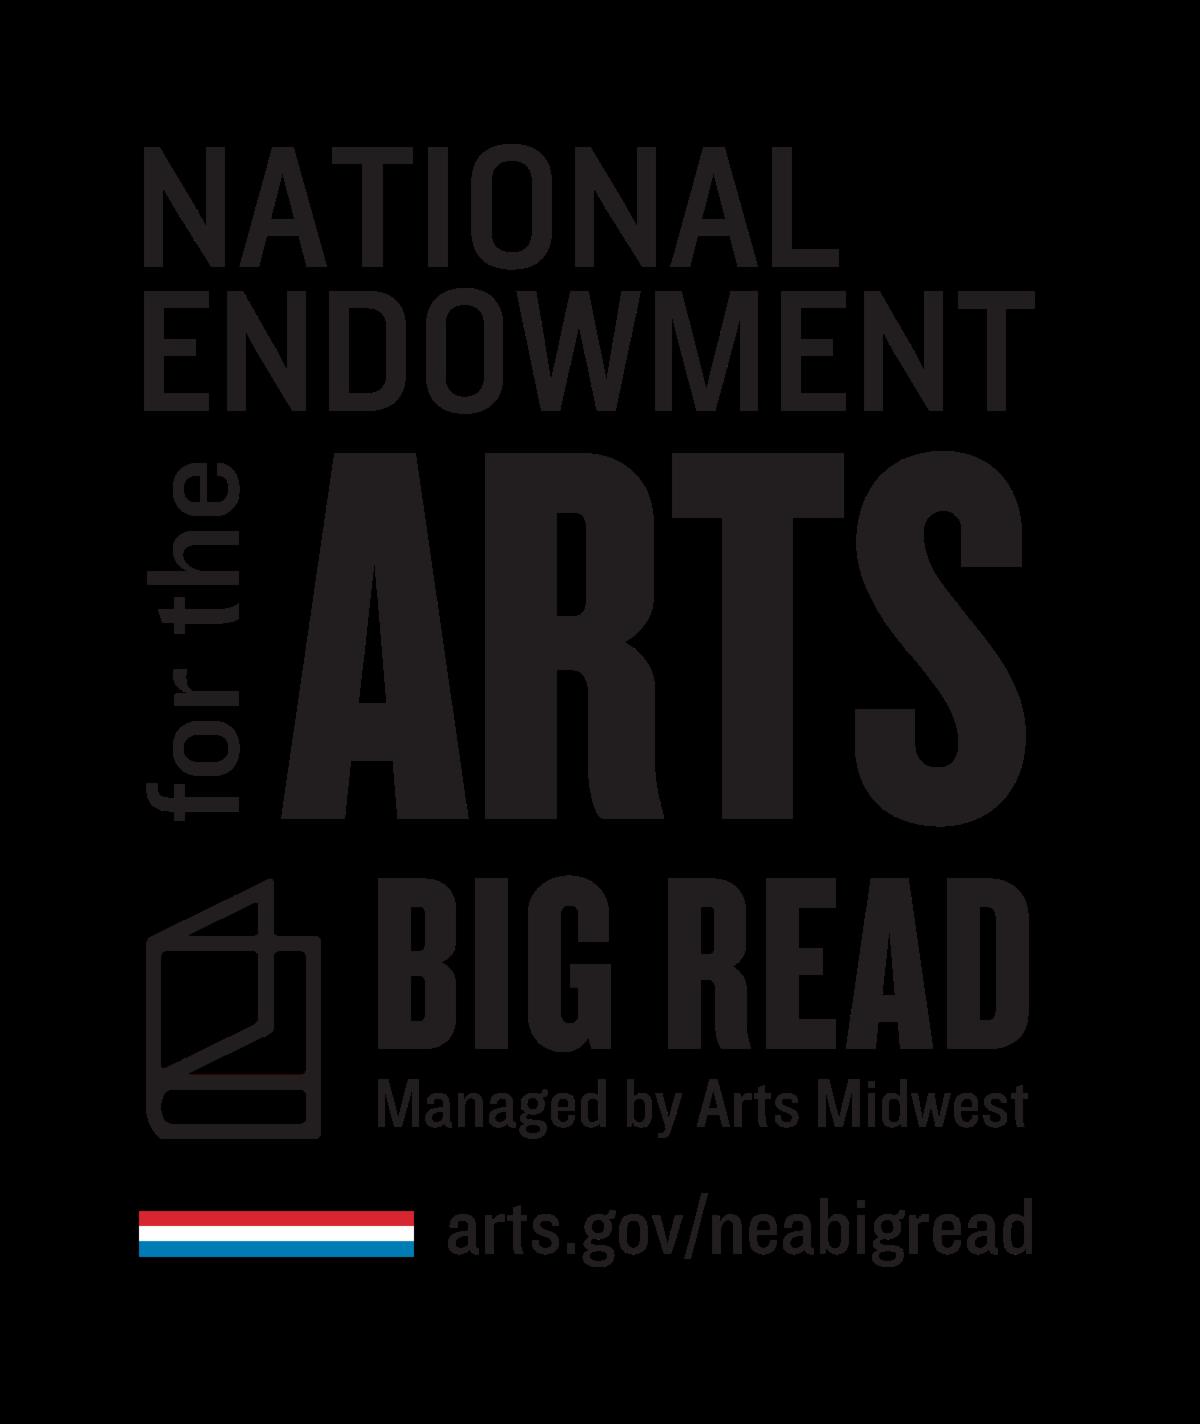 NEA's Big Read NEA's Big Read